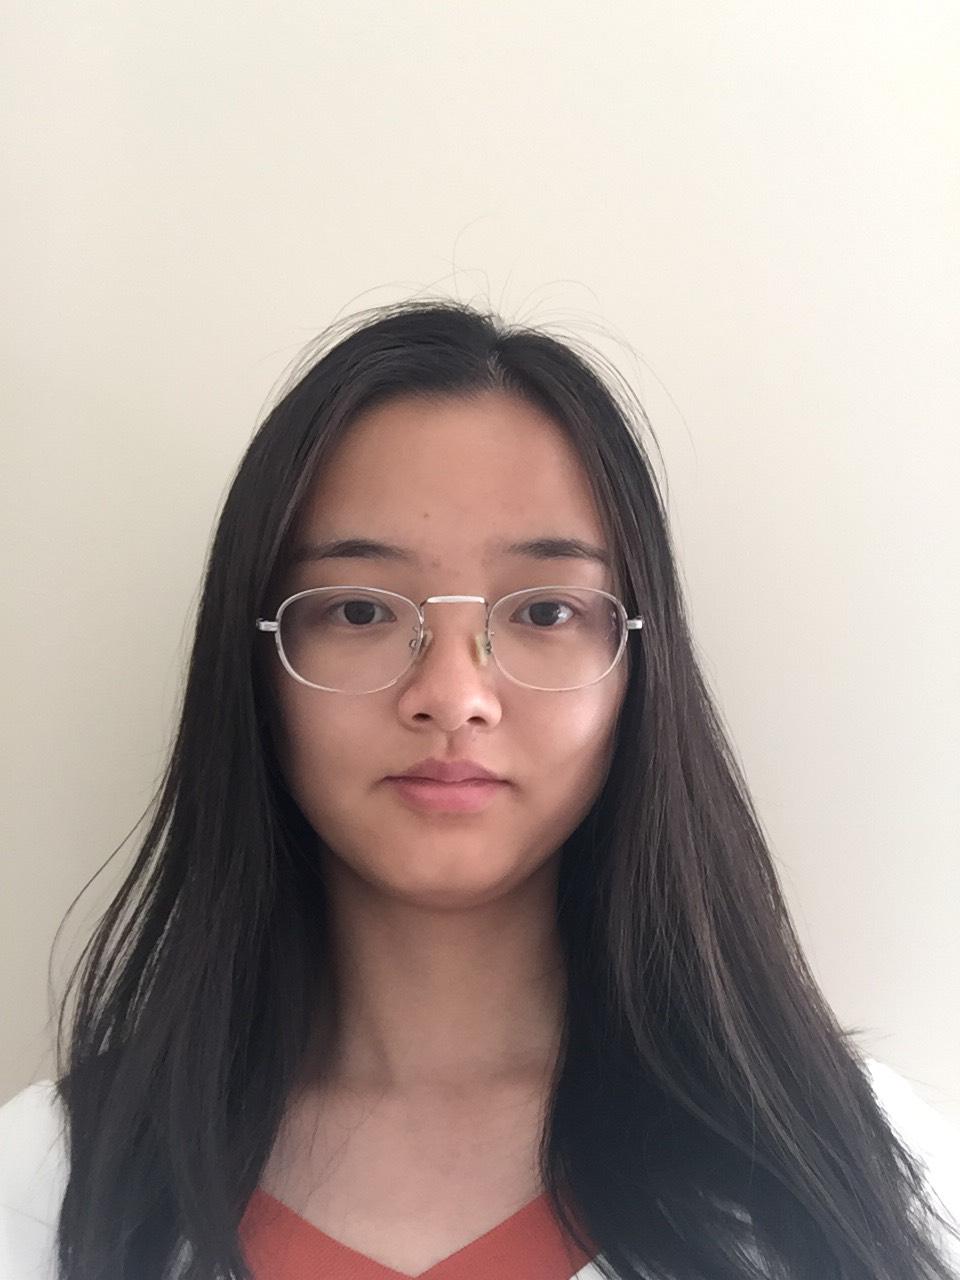 Graduate Student - B.Sc. Beijing Institute of Technology